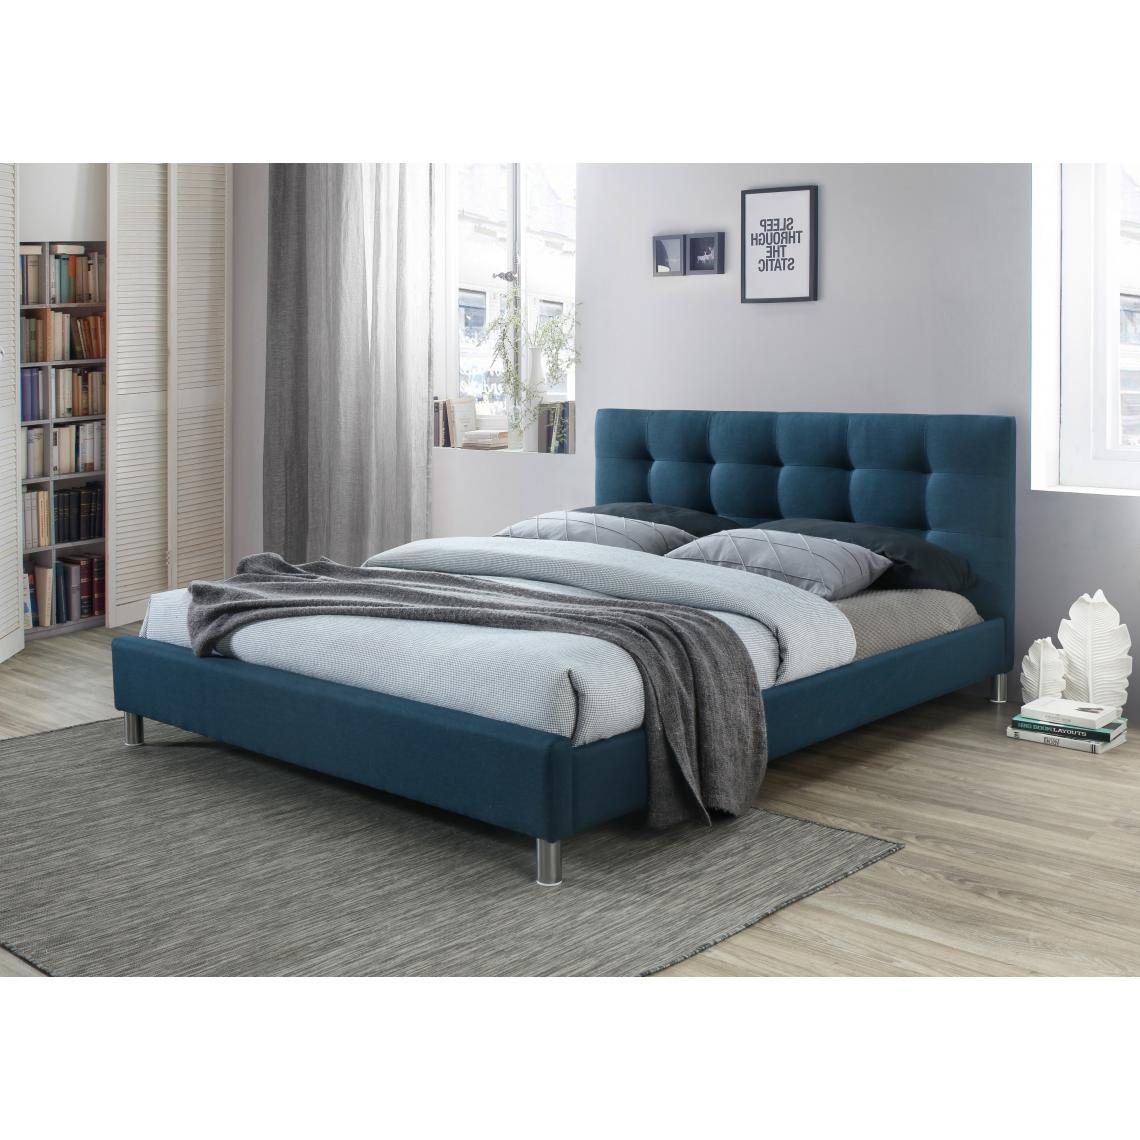 lit bleu 160 en tissu avec t te de lit capitonn e eva. Black Bedroom Furniture Sets. Home Design Ideas